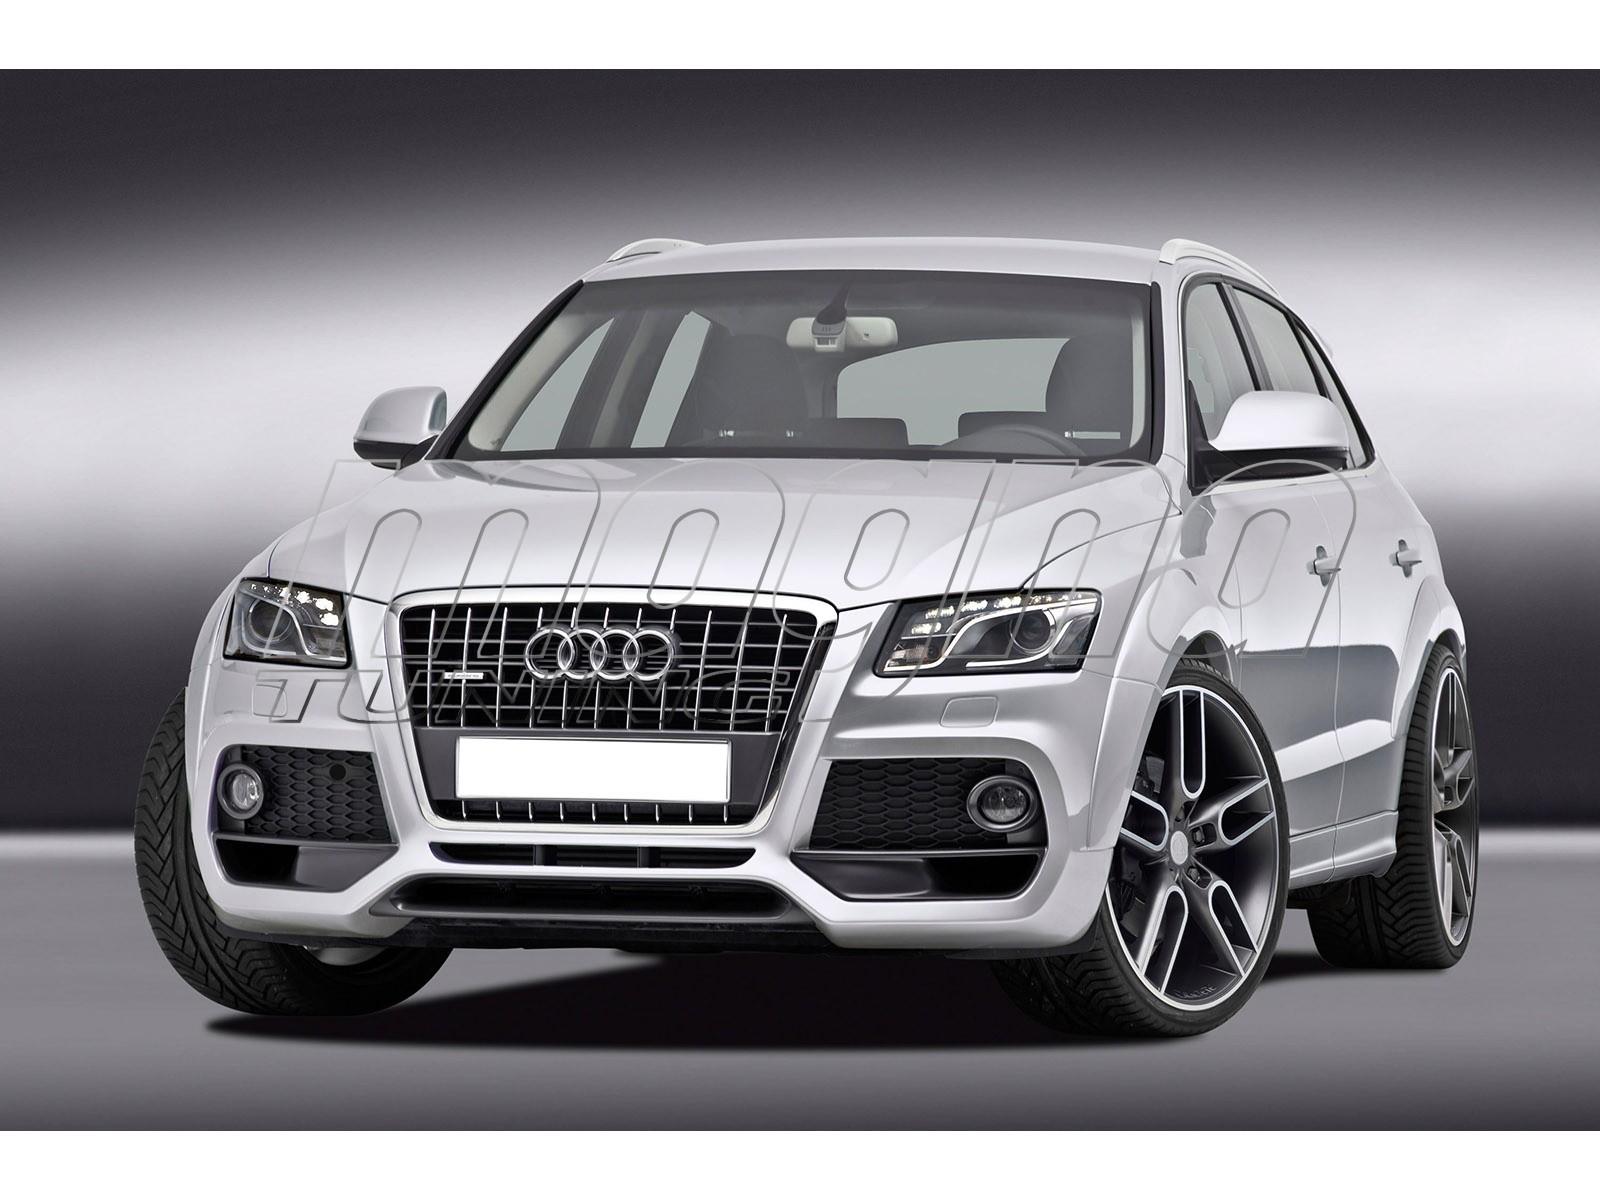 Audi Q5 8R C2 Frontstossstange